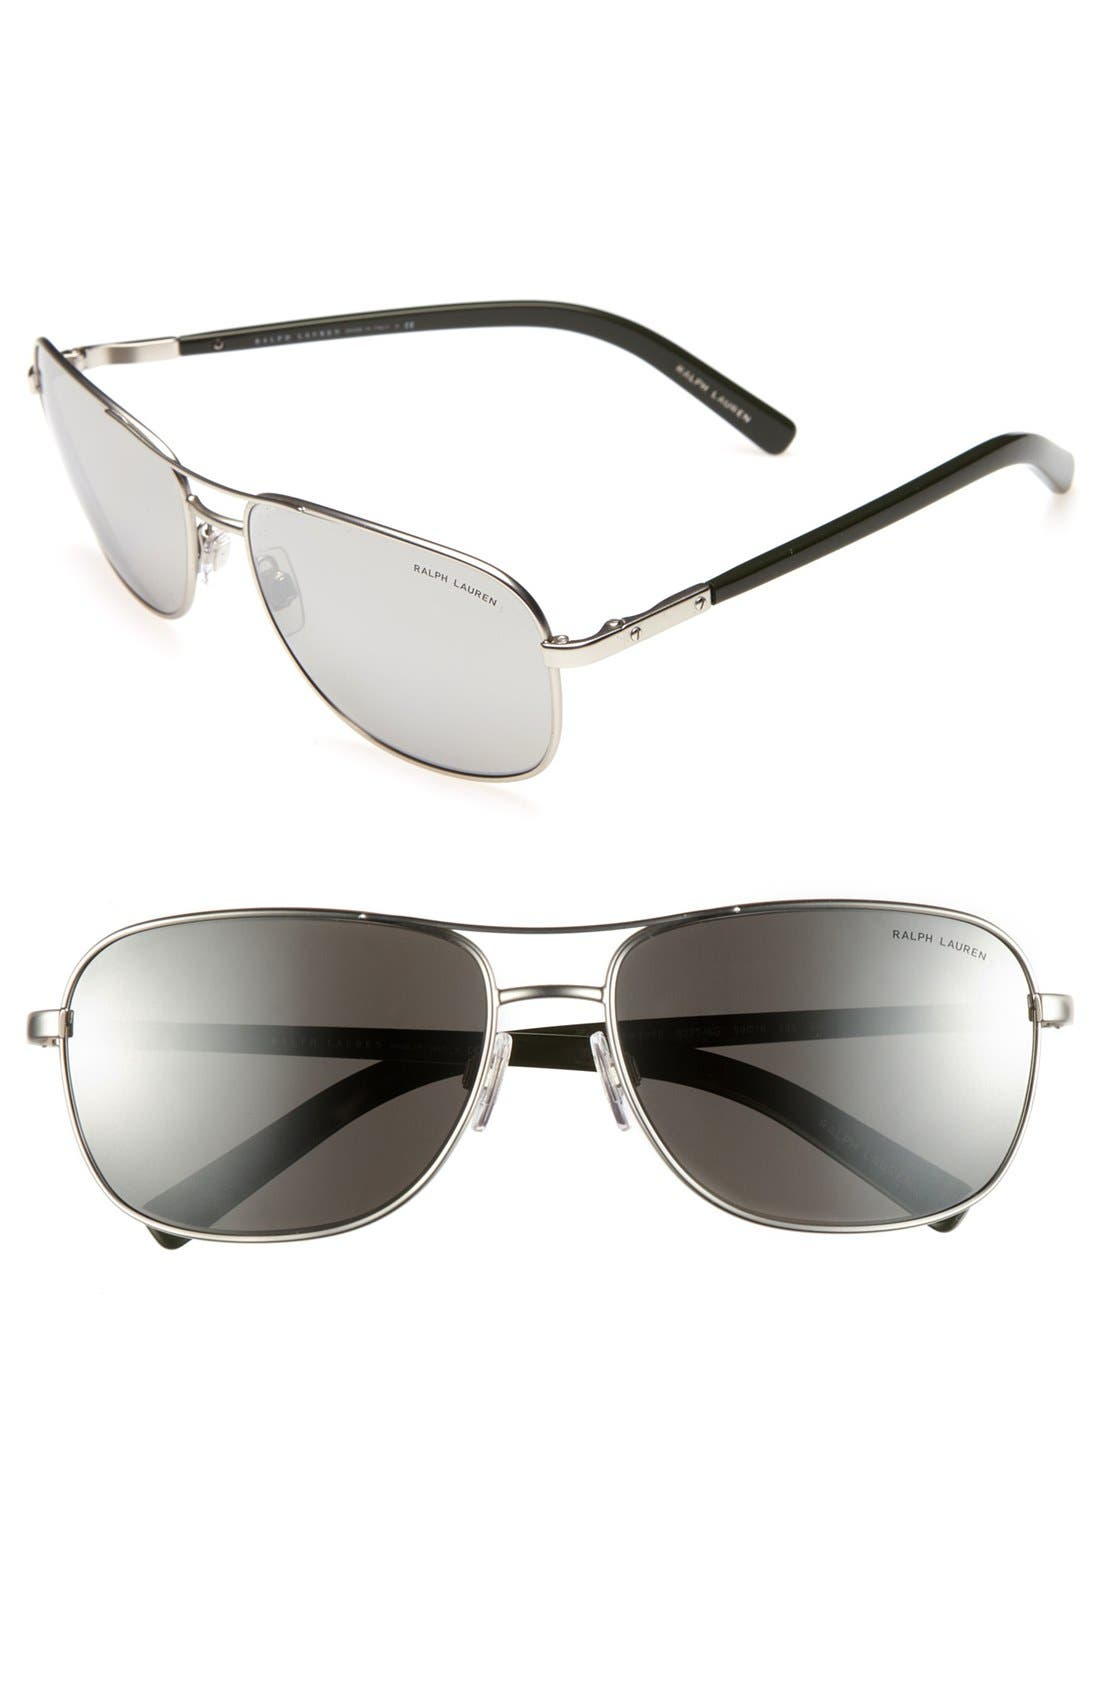 Main Image - Polo Ralph Lauren 59mm Keyhole Sunglasses